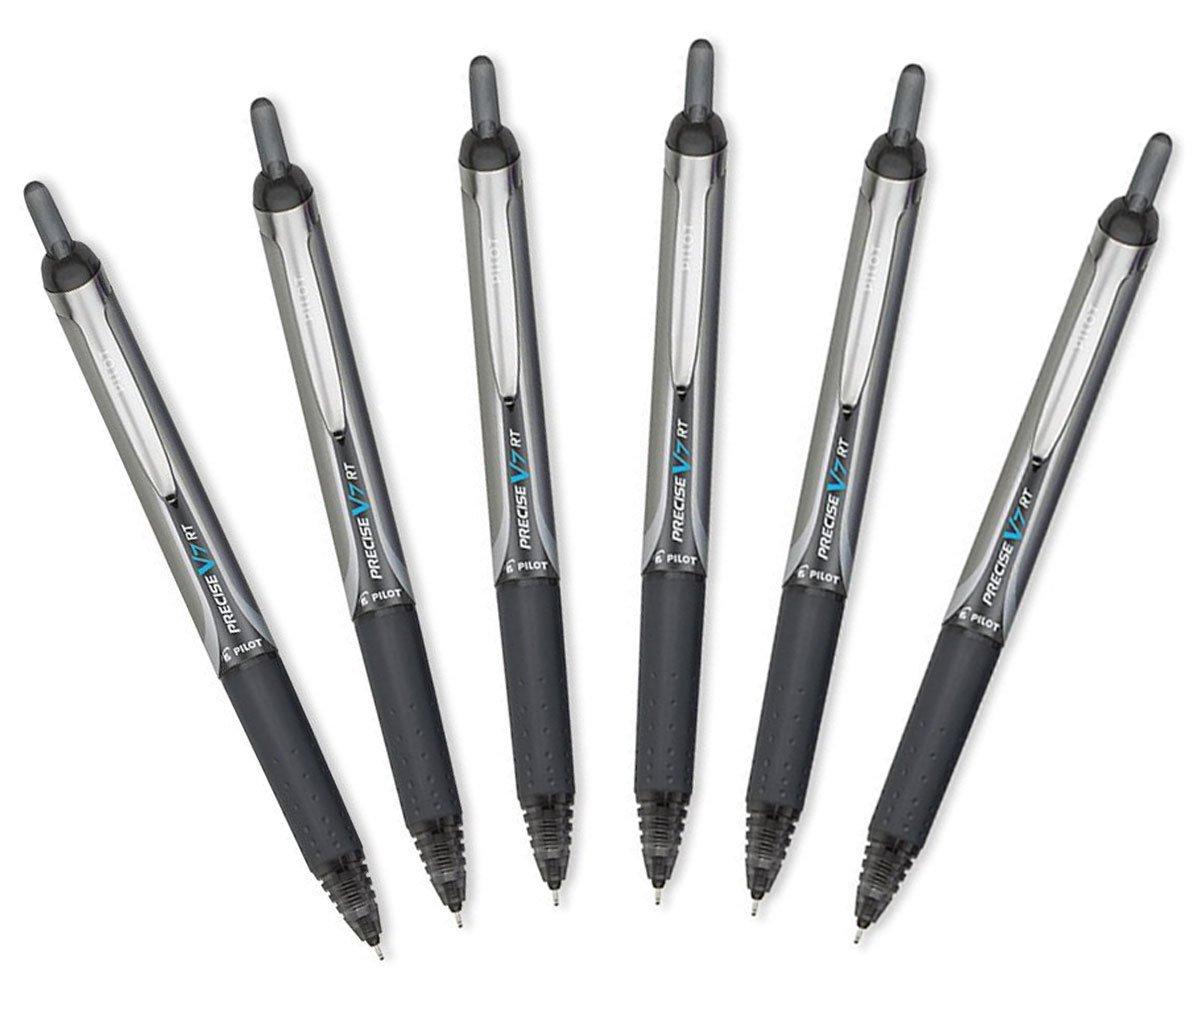 Black Ink 6 Pack Fine Point Pilot Precise V7 RT Retractable Rolling Ball Pens